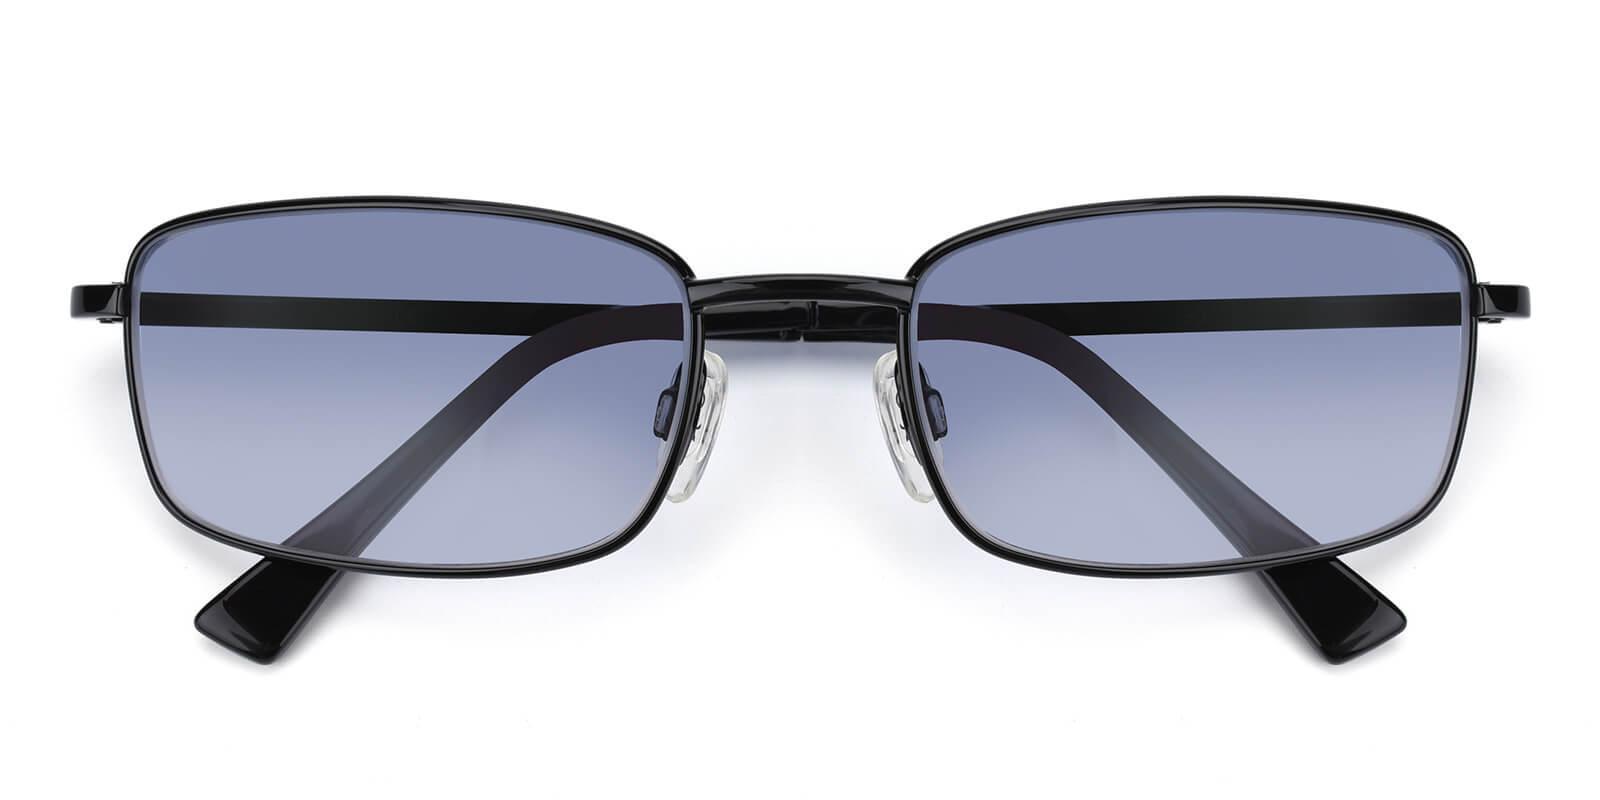 Cheynish-Black-Rectangle-Metal-Sunglasses-detail